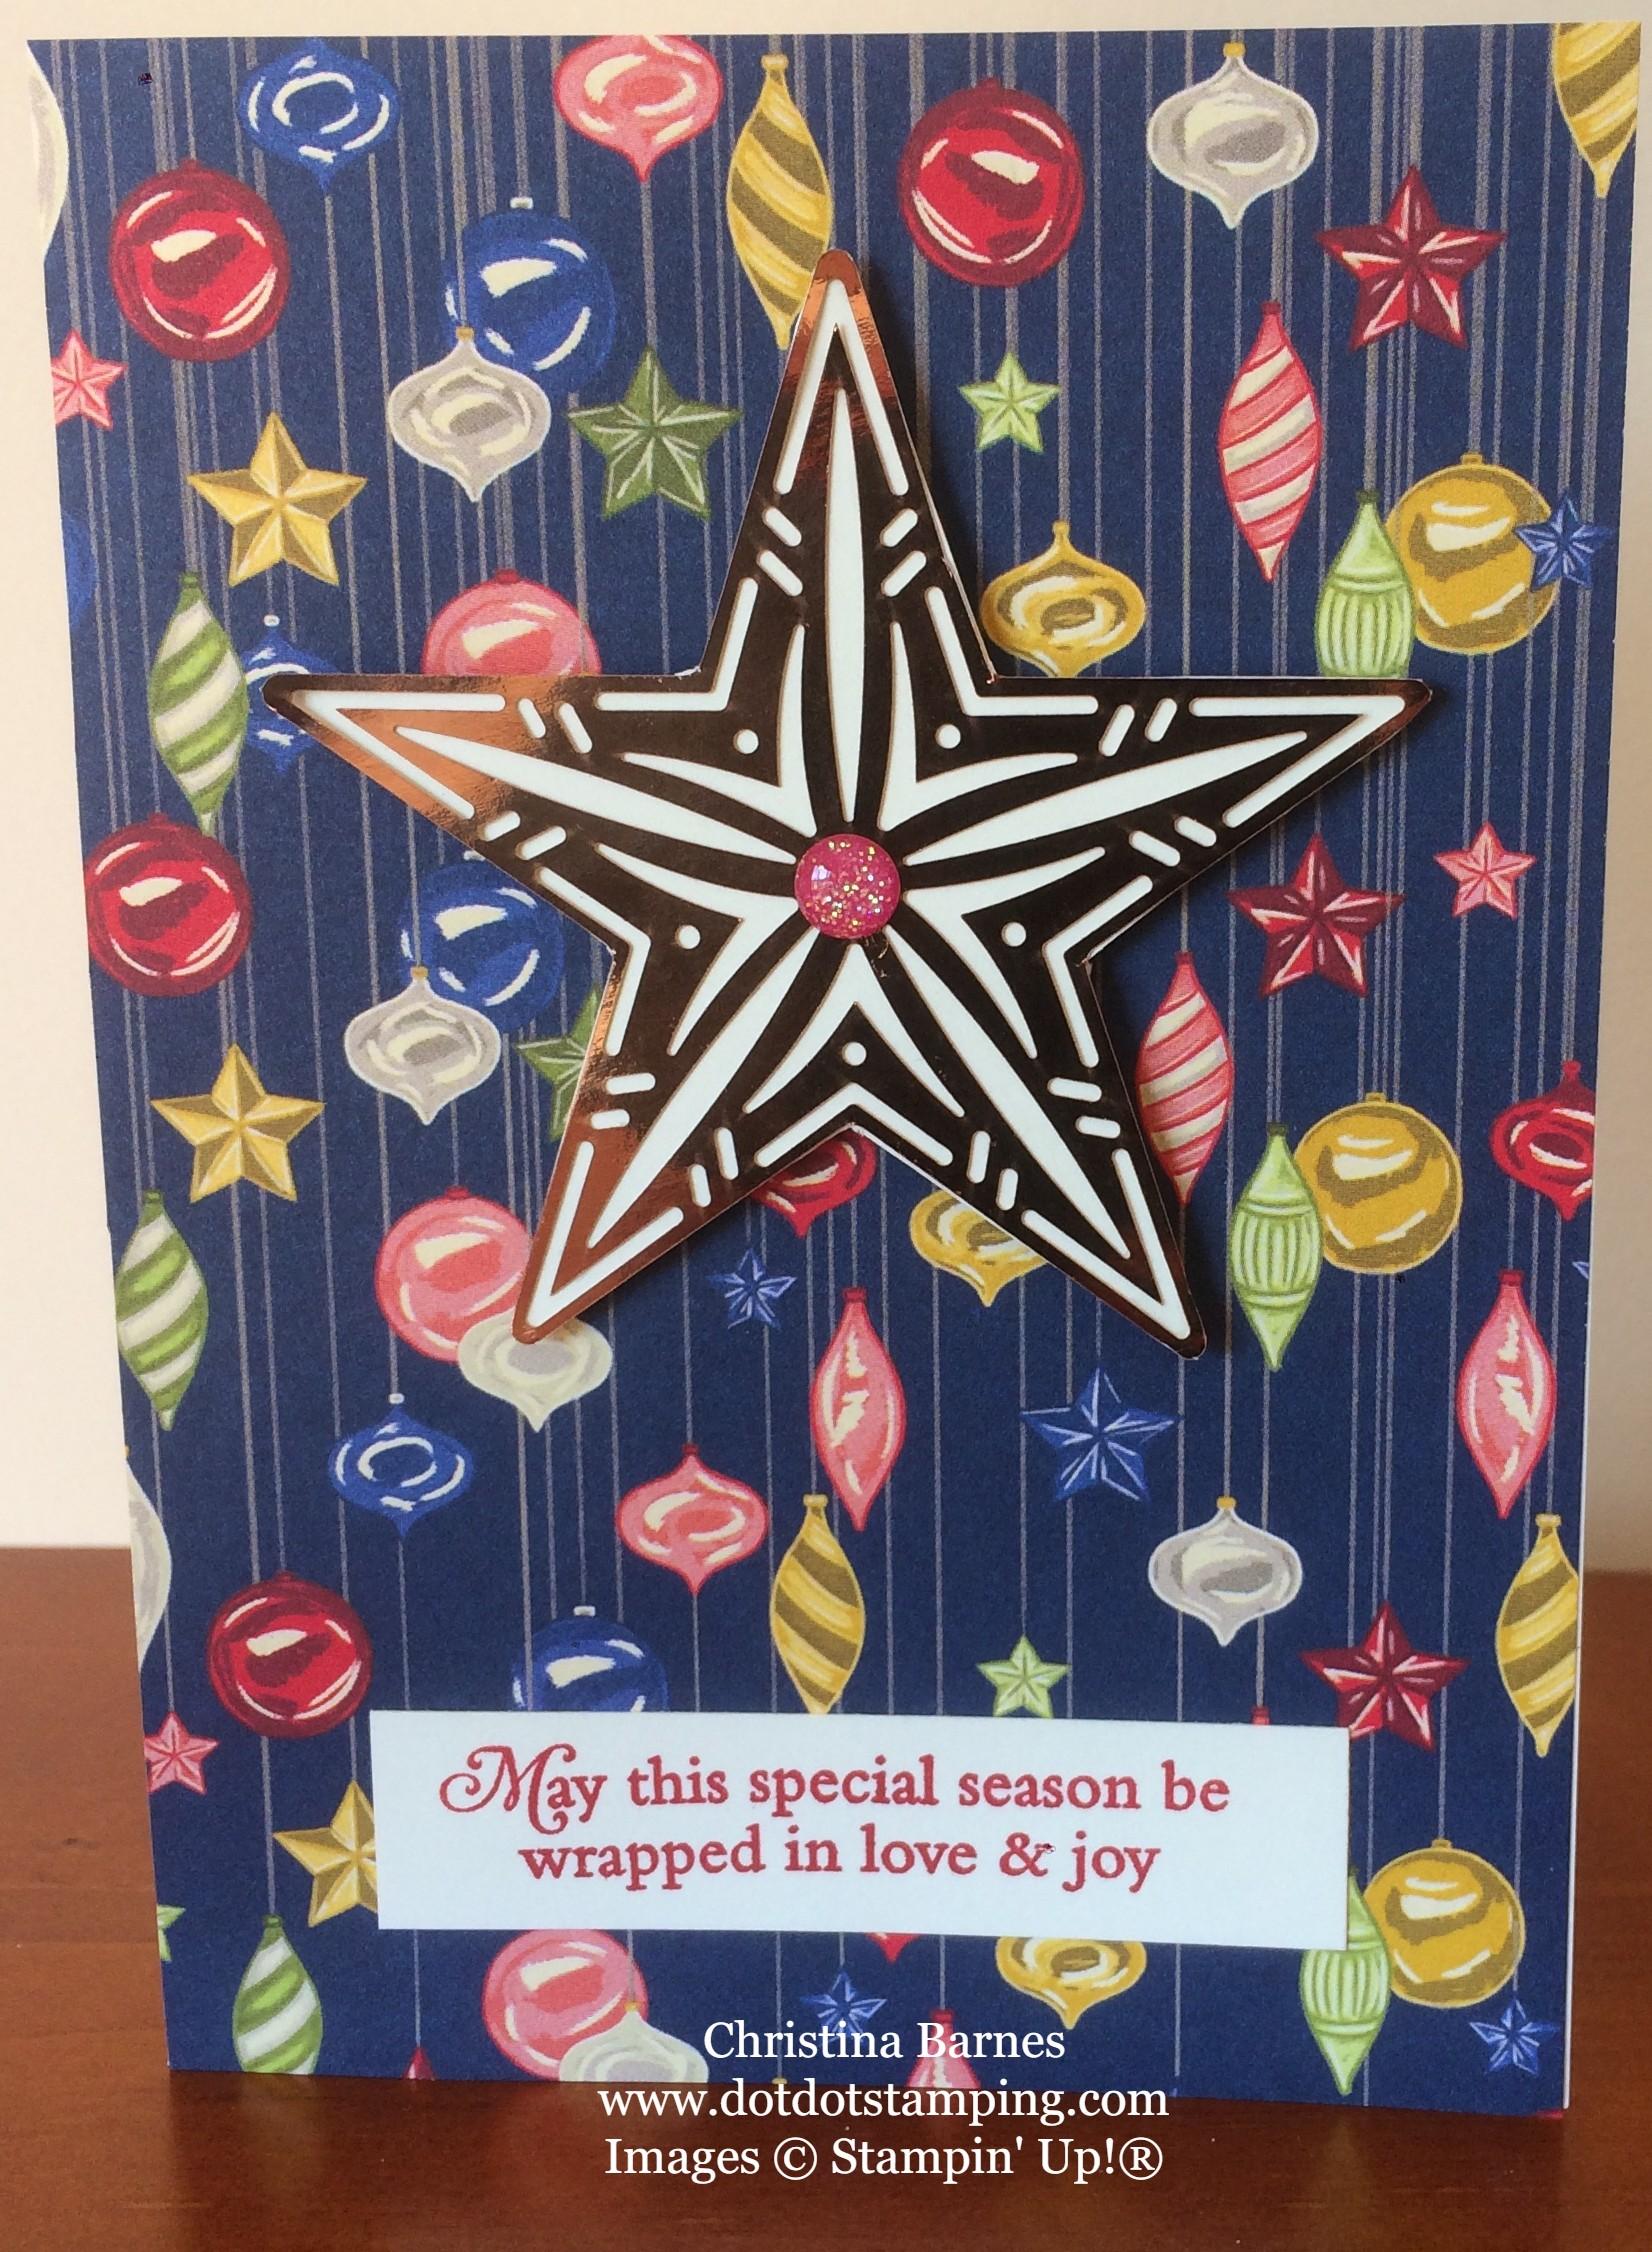 Night Before Christmas Designer Series Paper Card 4 Stampin' Up! 2019 Holiday Catalogue Christina Barnes Dot Dot Stamping